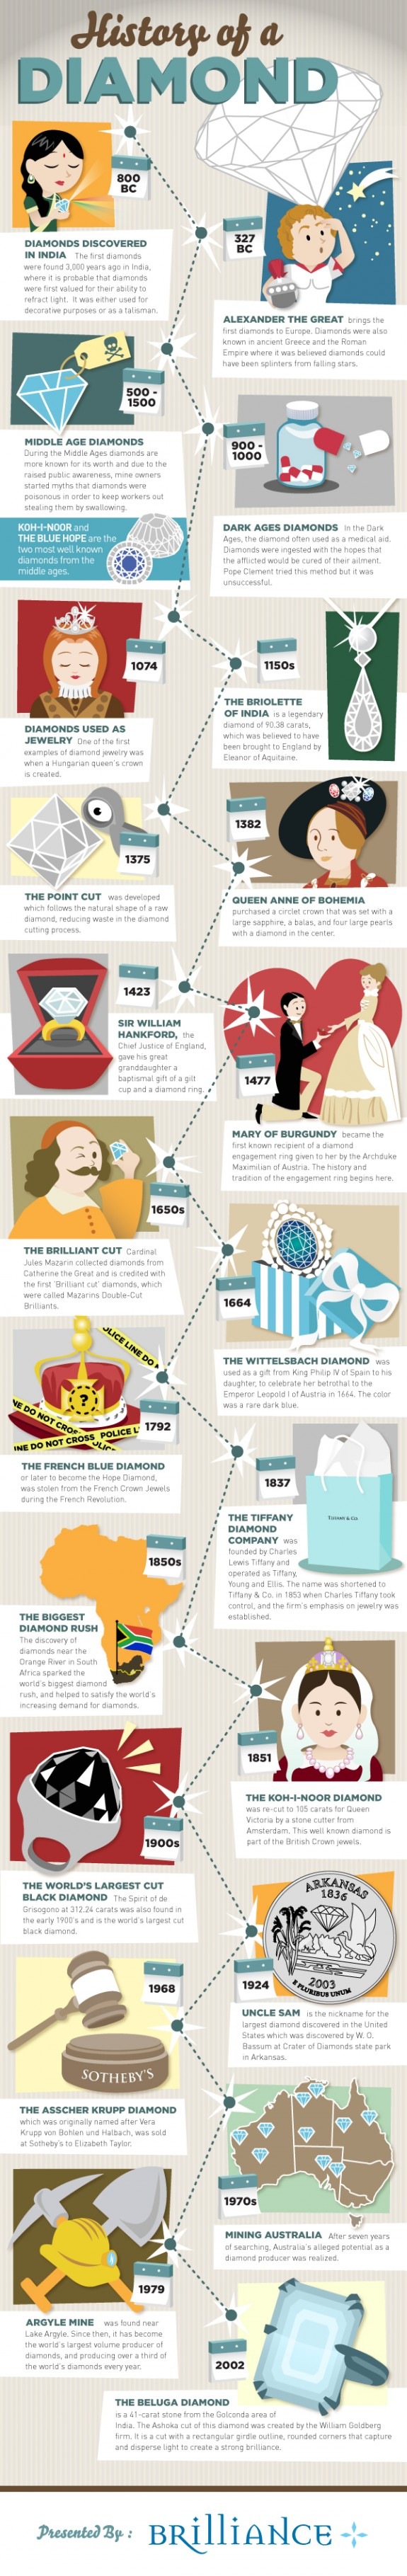 brilliance-infographic